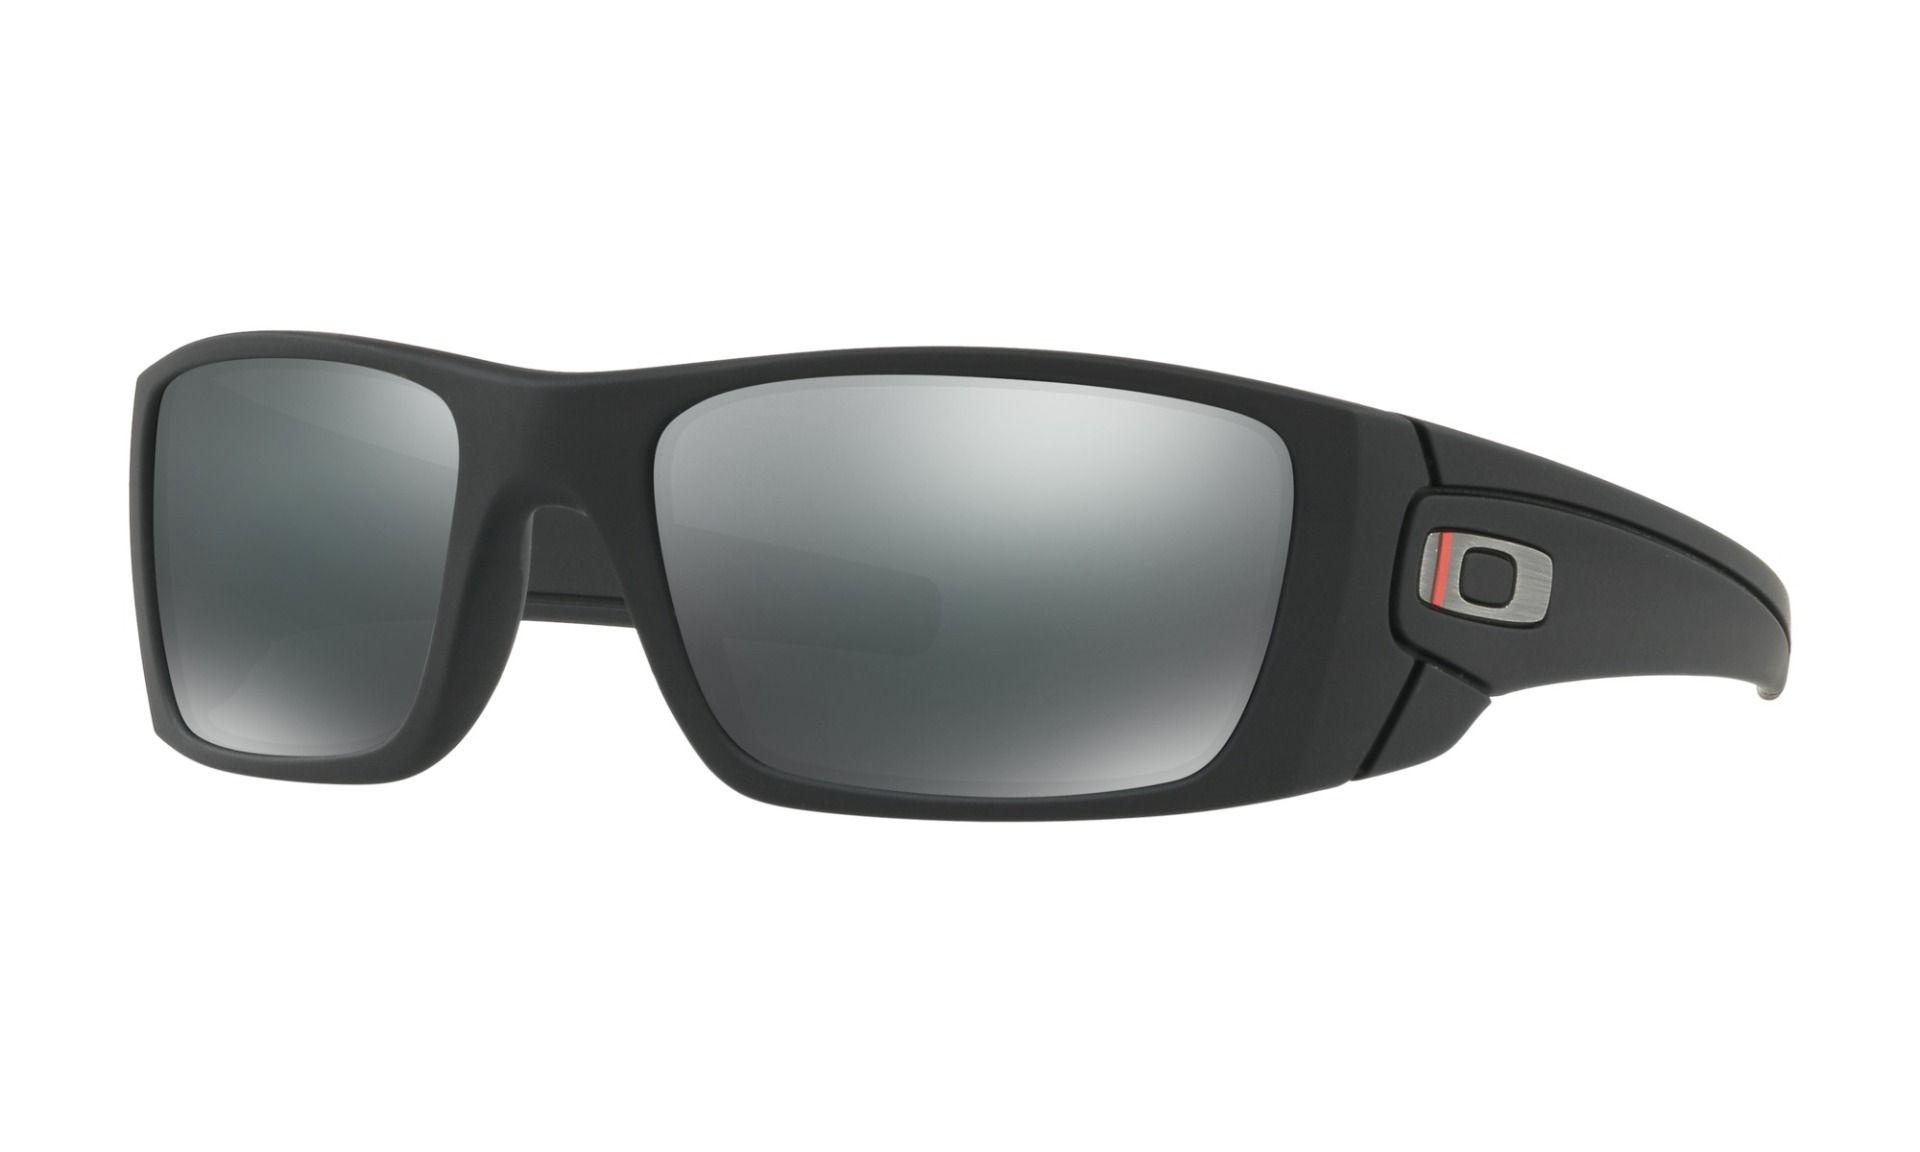 956d85301e4a2 Oakley SI Fuel Cell ThinRedLine Satin Black w  Black Iridium